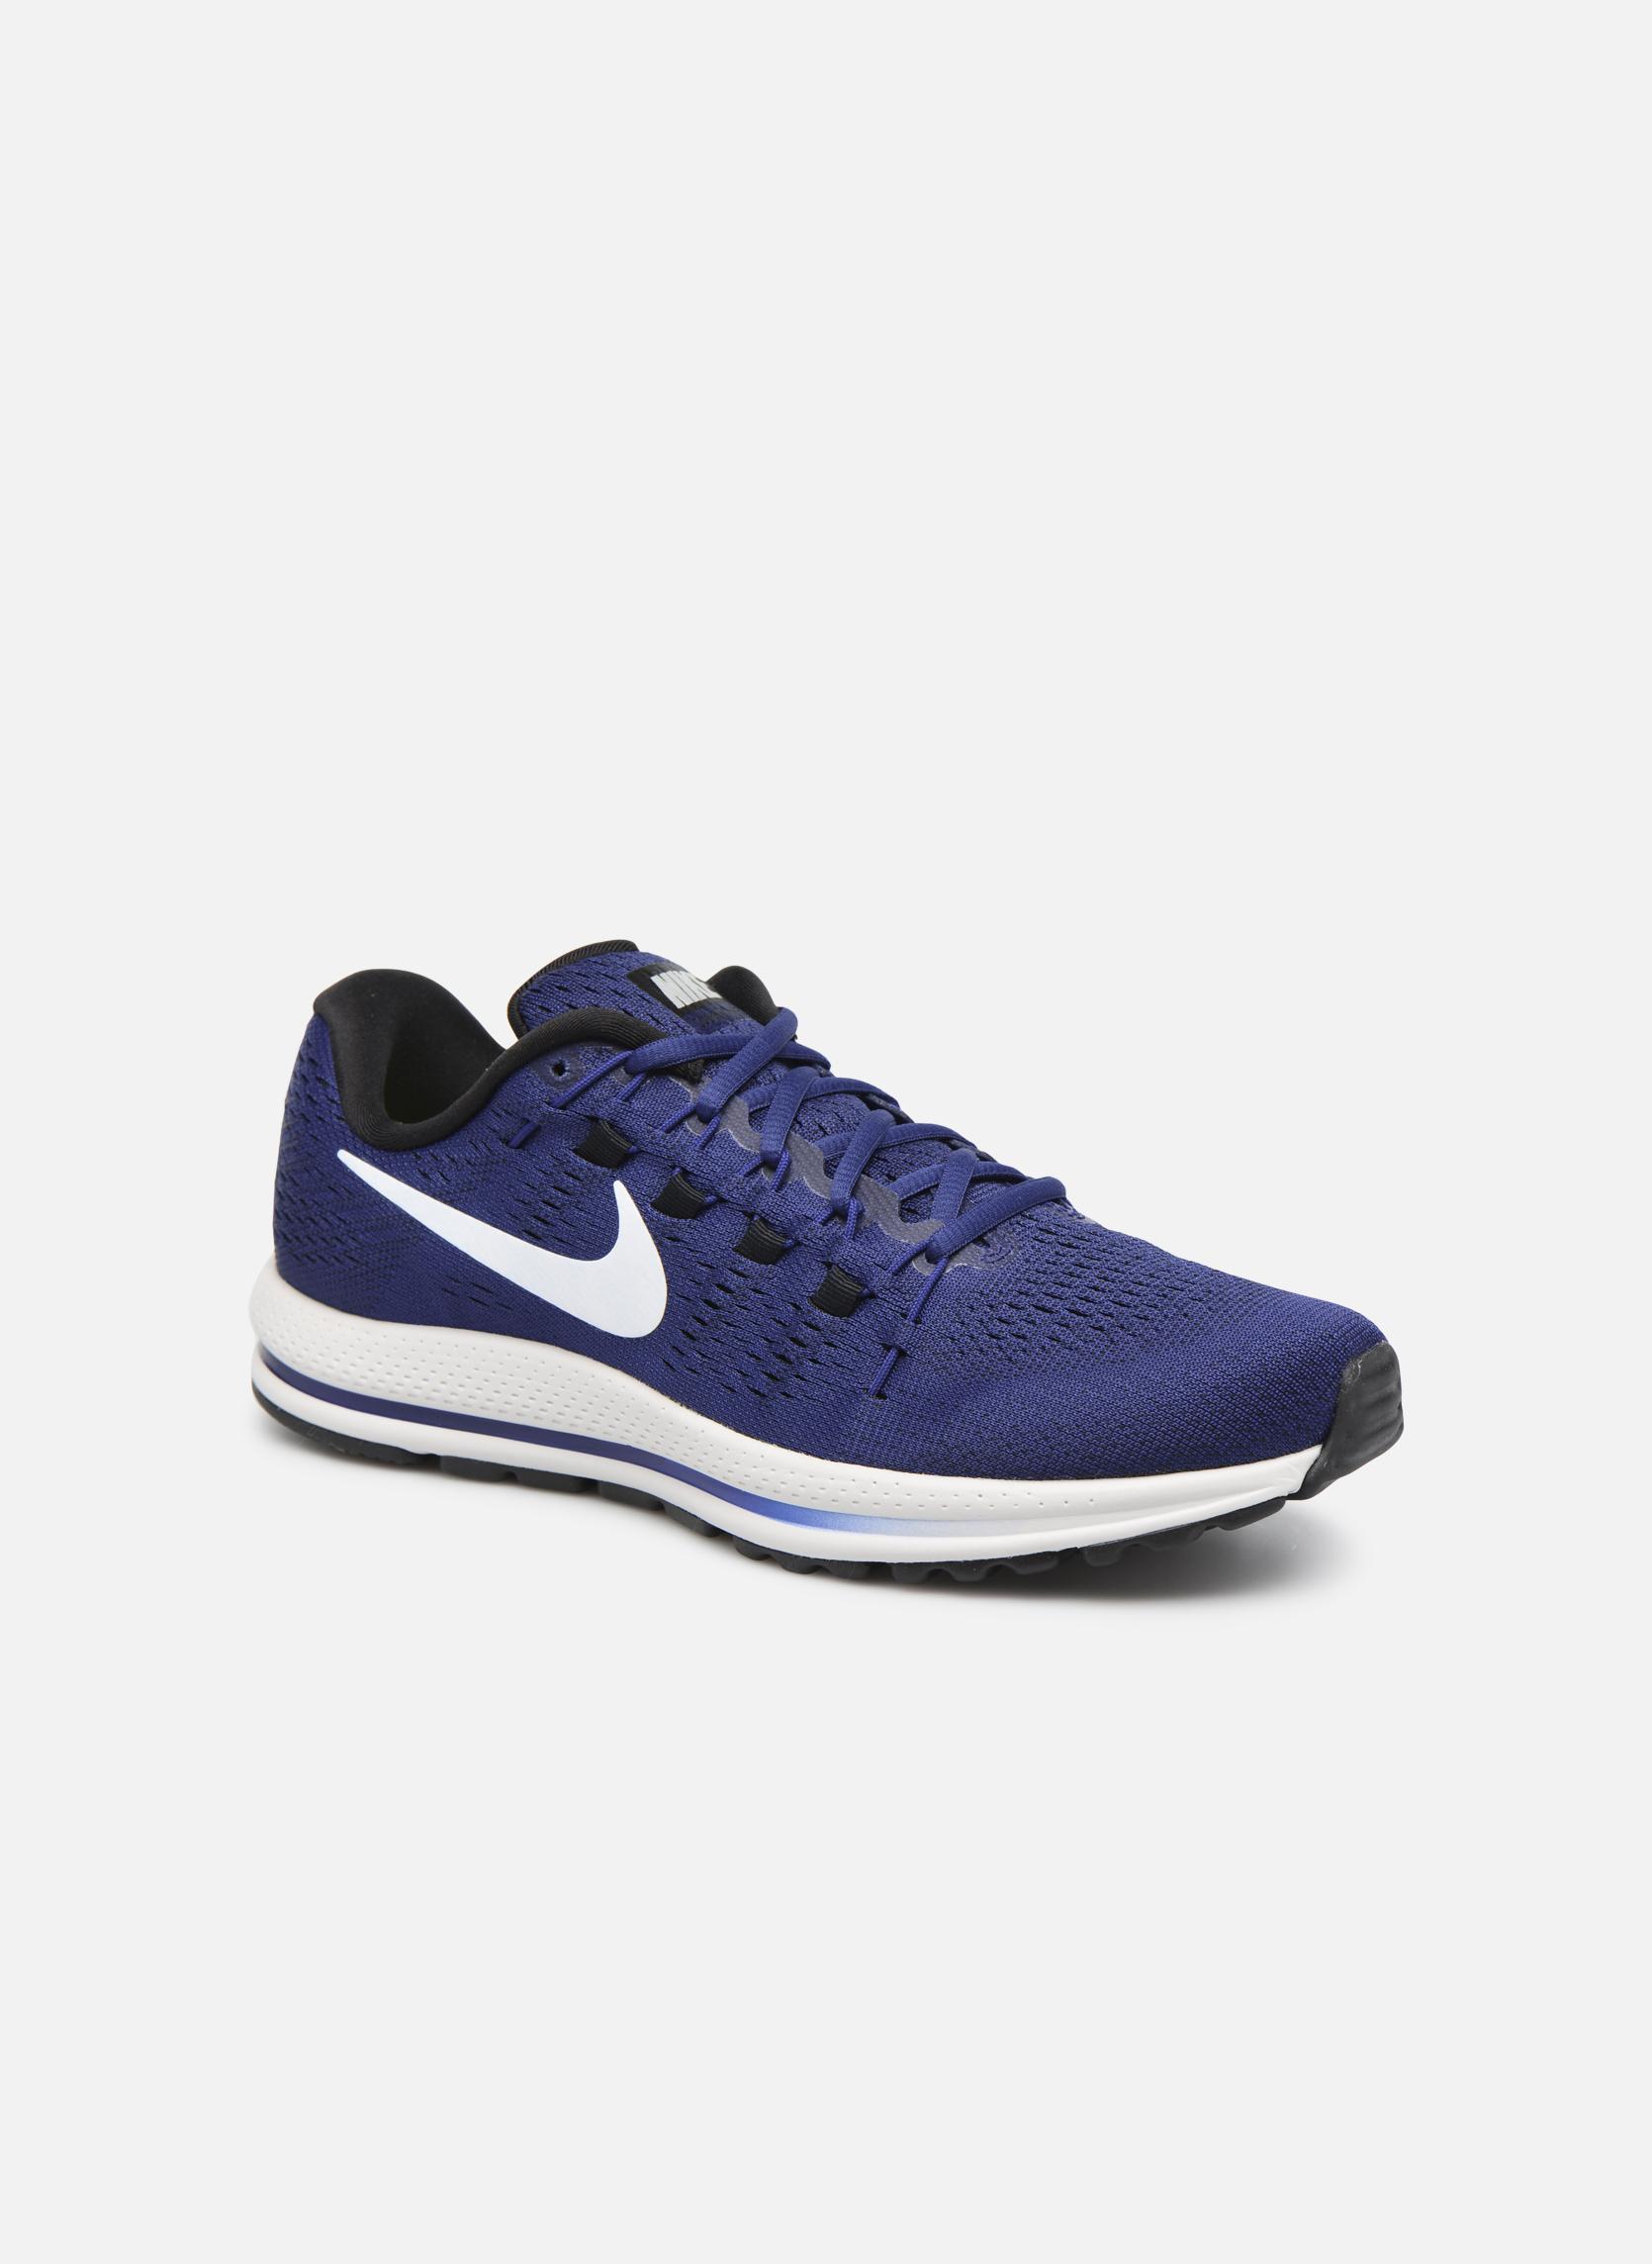 Chaussures de sport Homme Nike Air Zoom Vomero 12